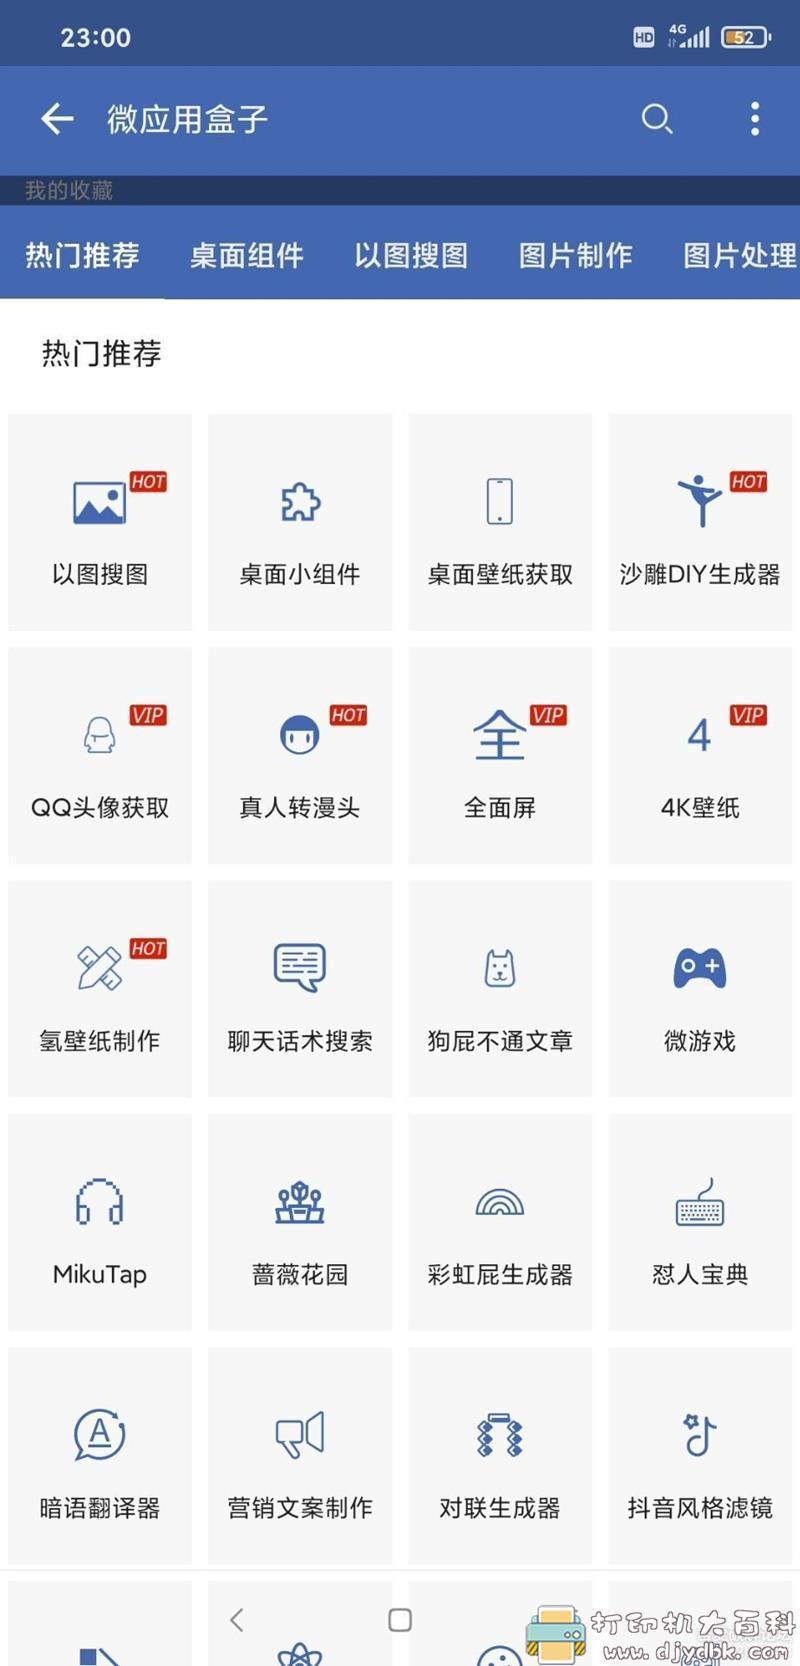 [Android]搜图神器最新版4.3.0元老捐赠会员,超多p站壁纸,二次元必备 配图 No.2